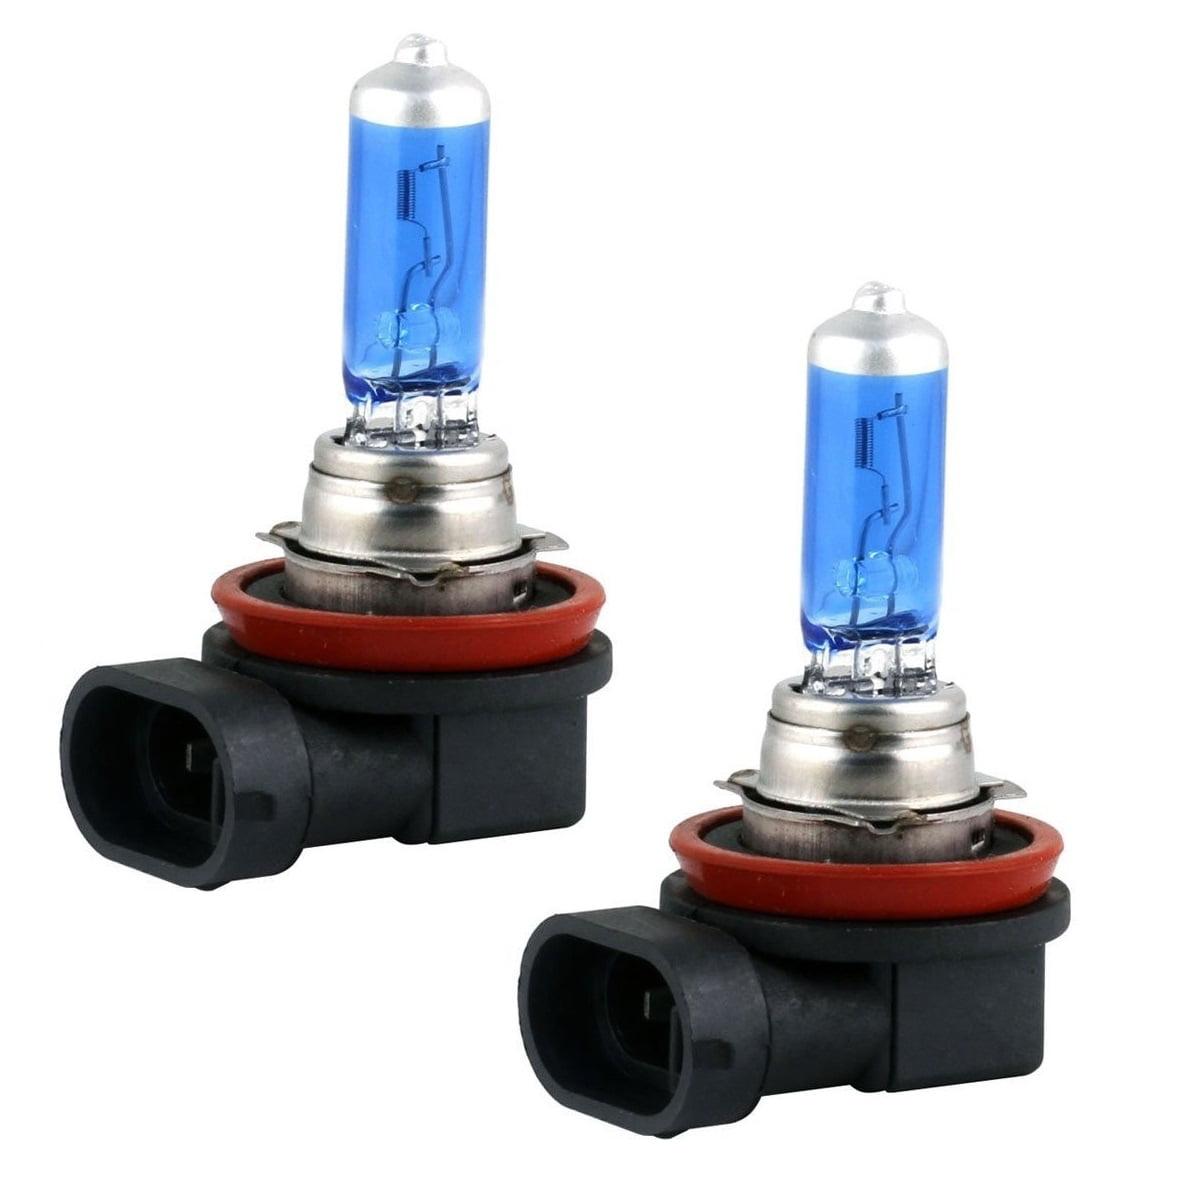 2x H11 Halogen 55W 12V Low-Beam Headlight/Driving Light/Fog Bulbs Bright White